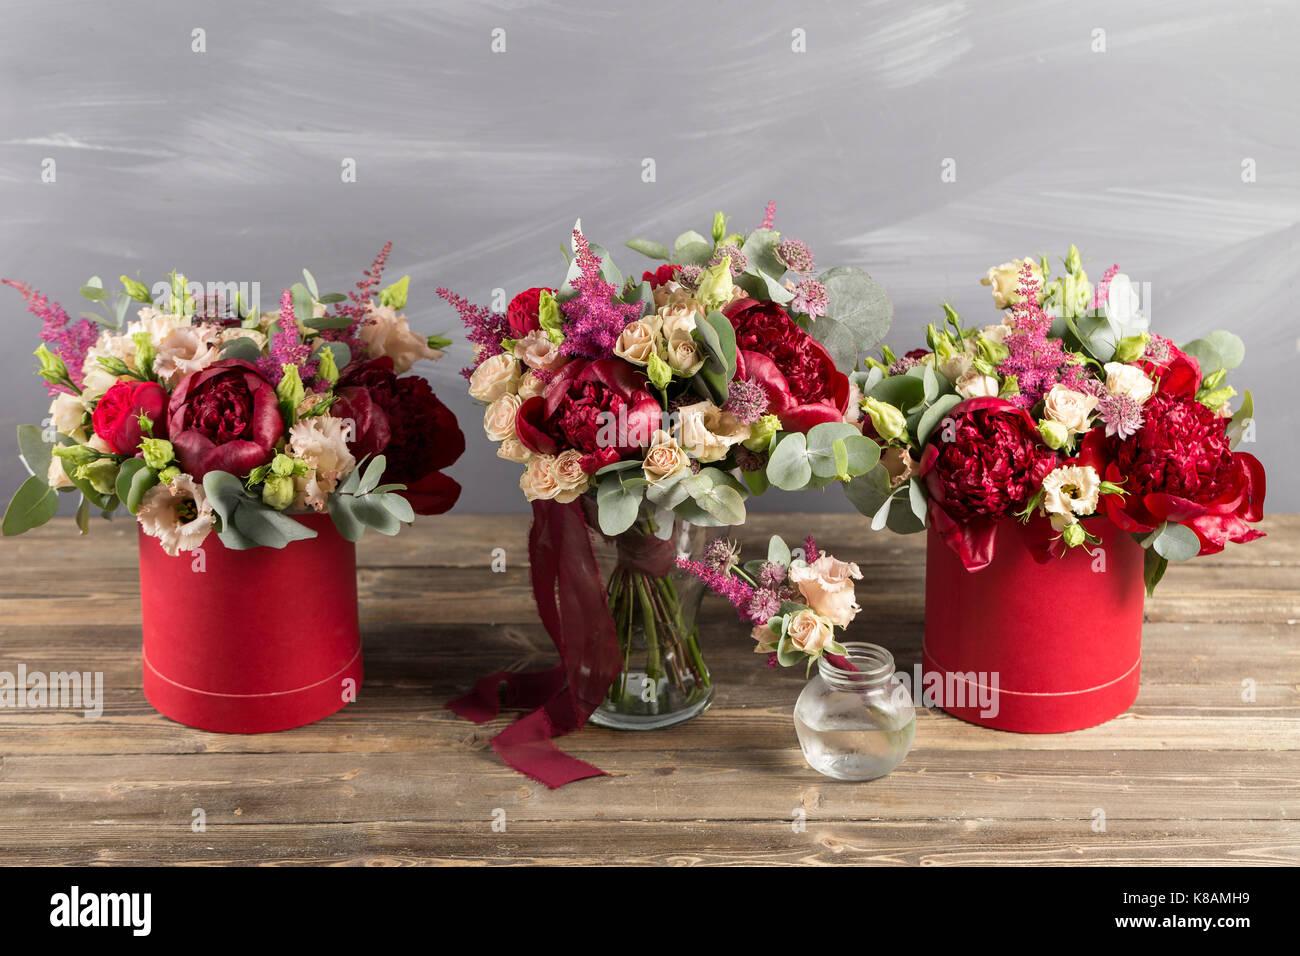 Peony Roses Stock Photos & Peony Roses Stock Images - Alamy